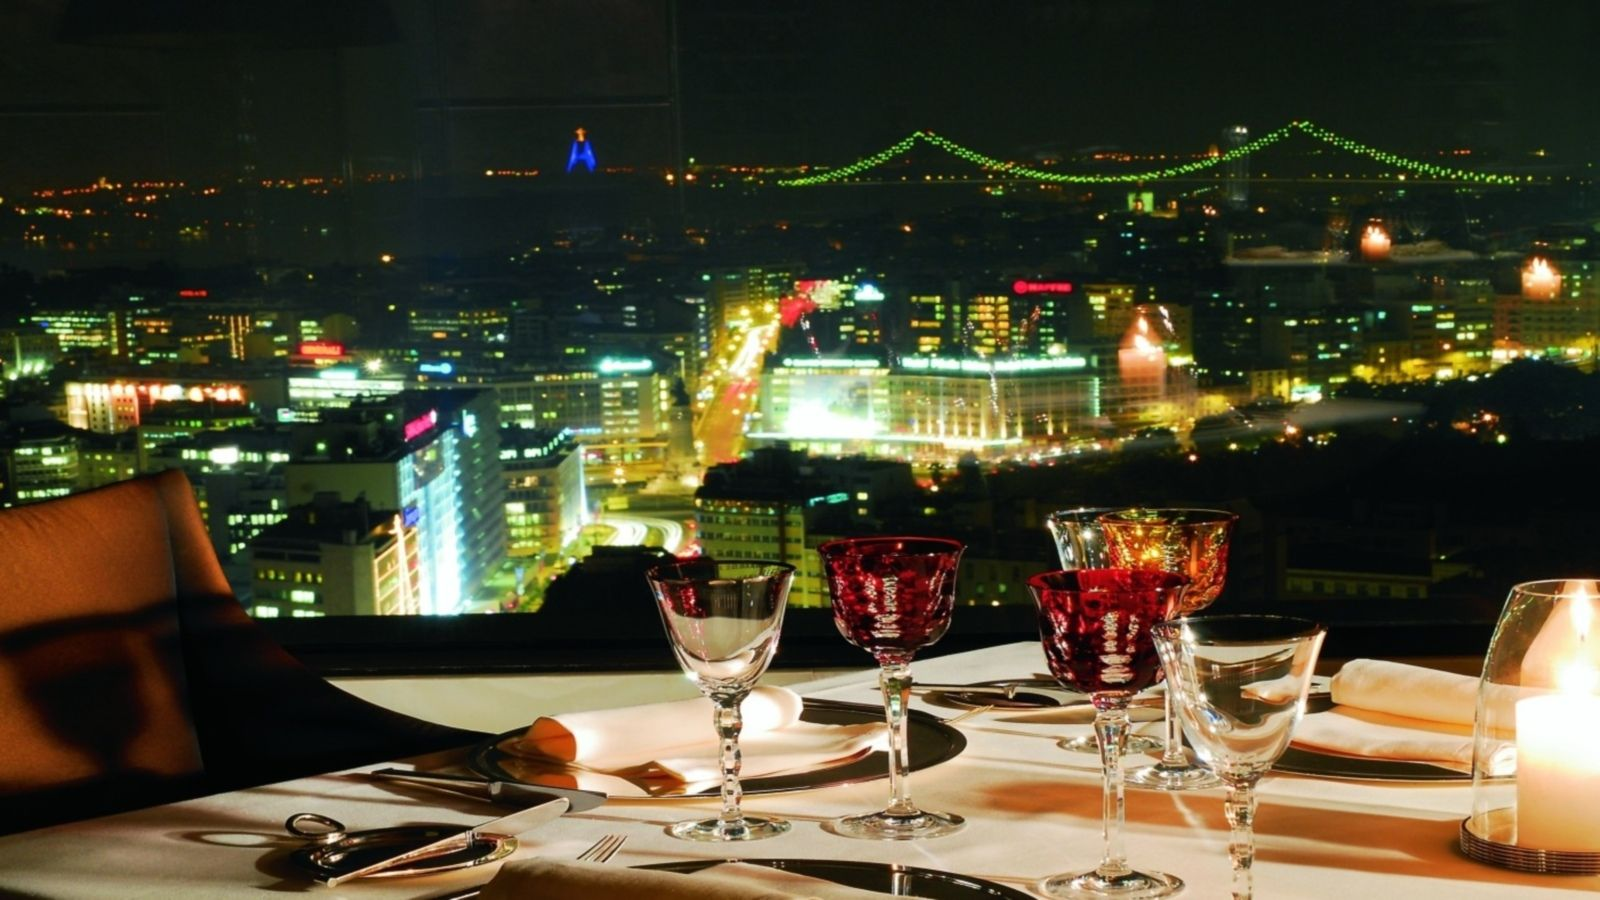 Inspire-se na vista mais apaixonante de Lisboa. Sheraton Lisboa Hotel & SPA